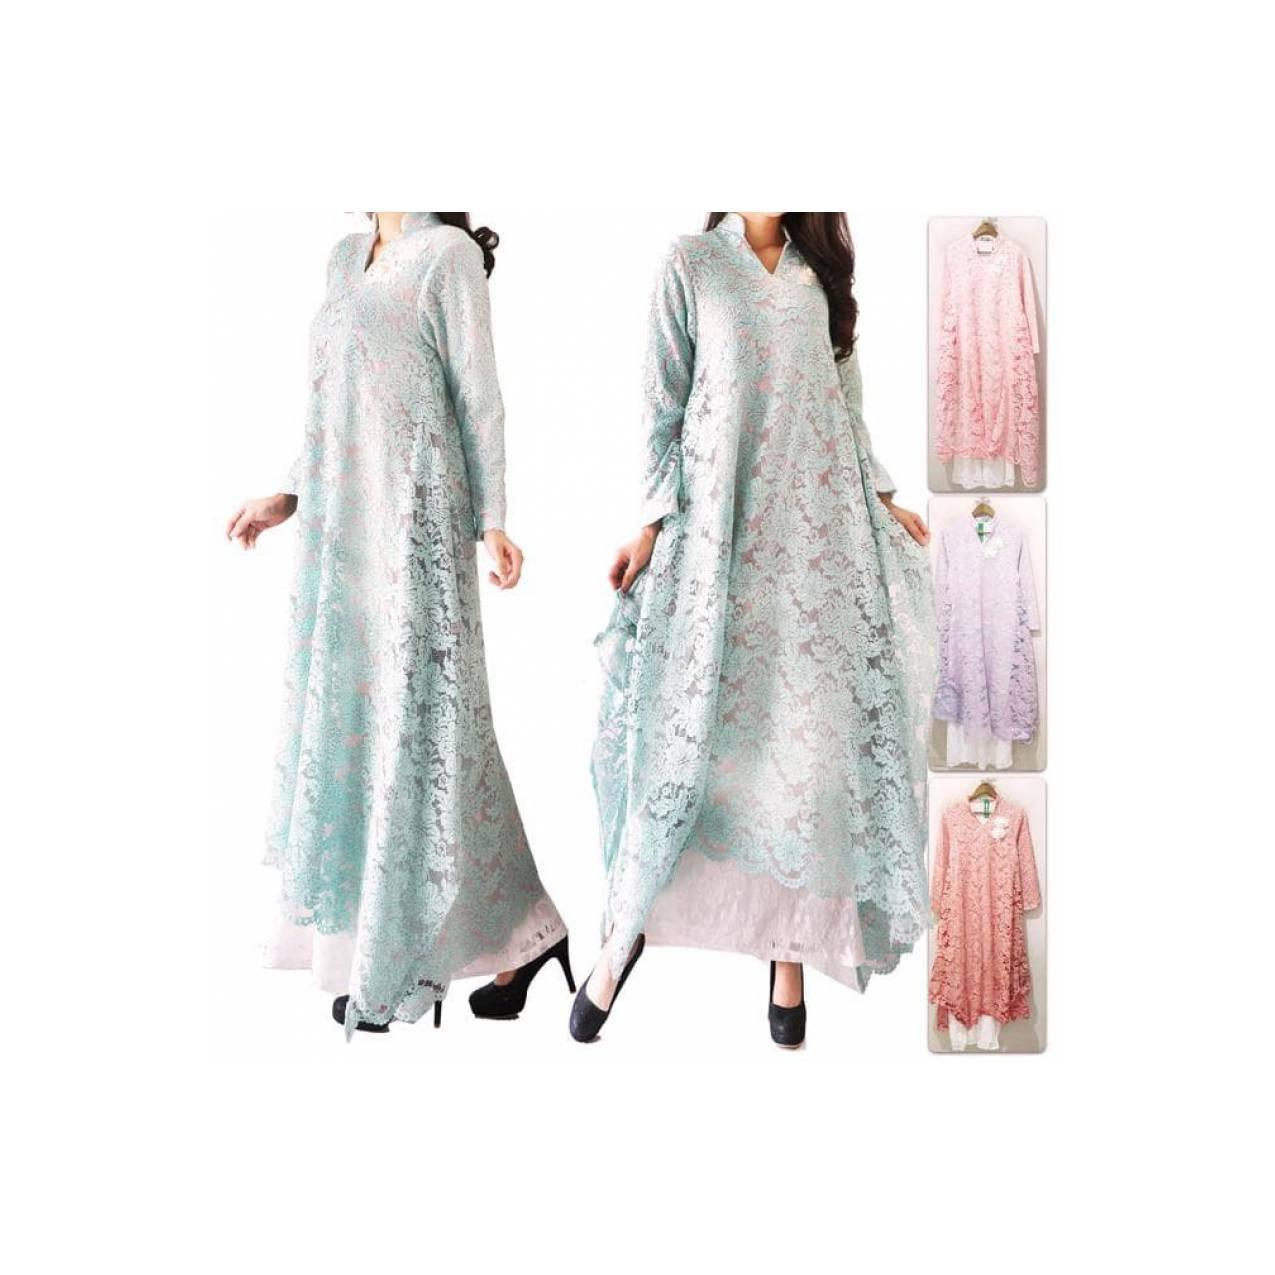 Gamis Maxi Full Brukat Zaskia / Maxi Dress / Lace Dresses / 11727